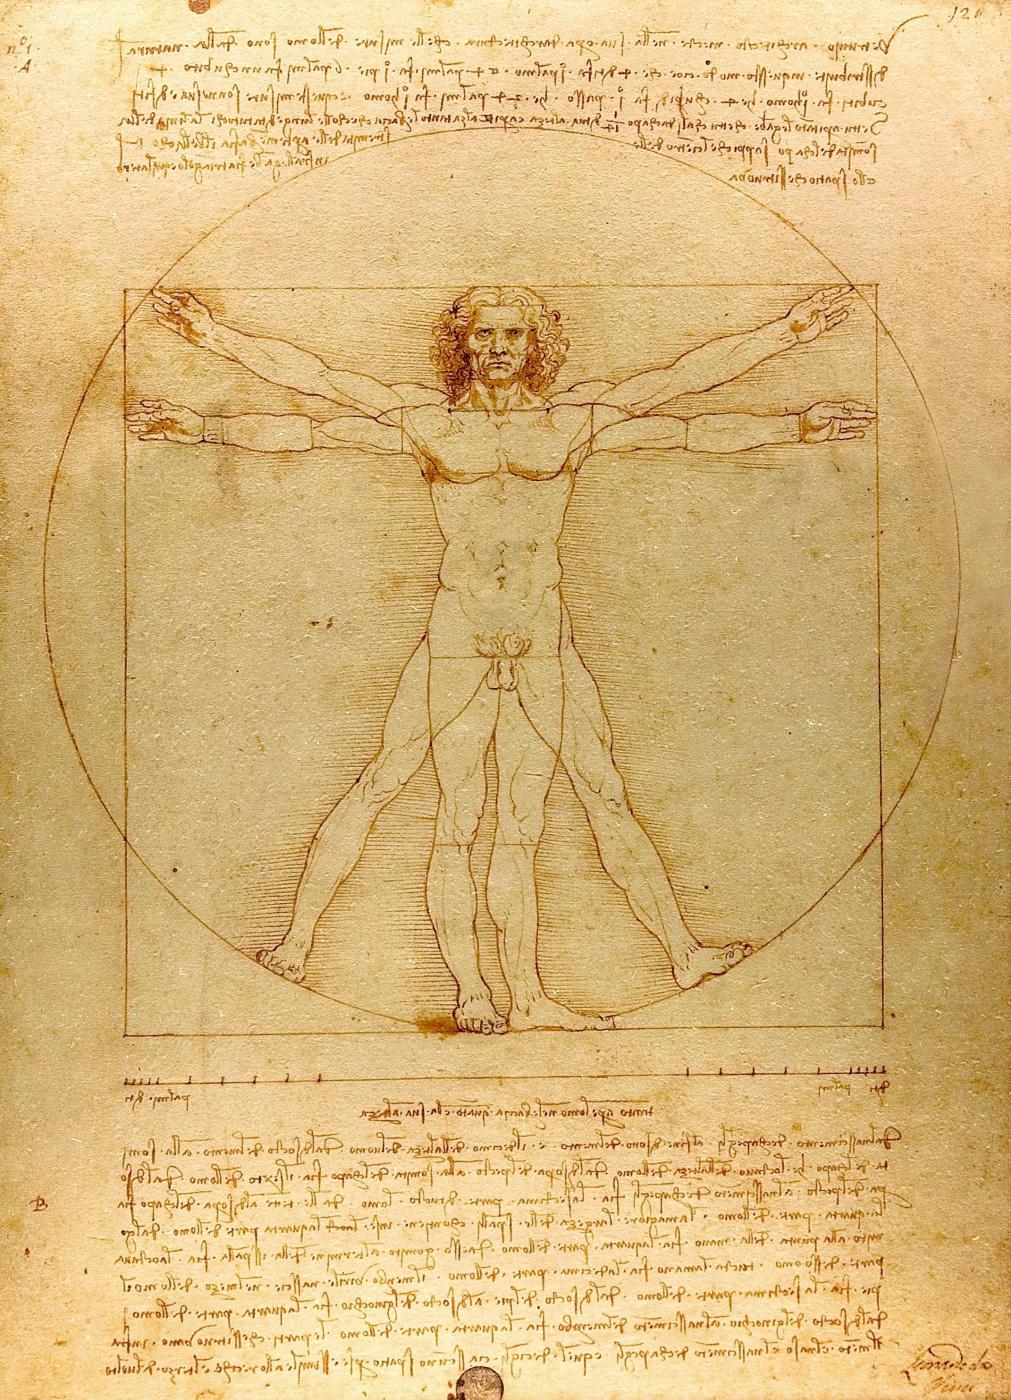 Leonardo da Vinci. Vitruvian man (the proportions of the human body)